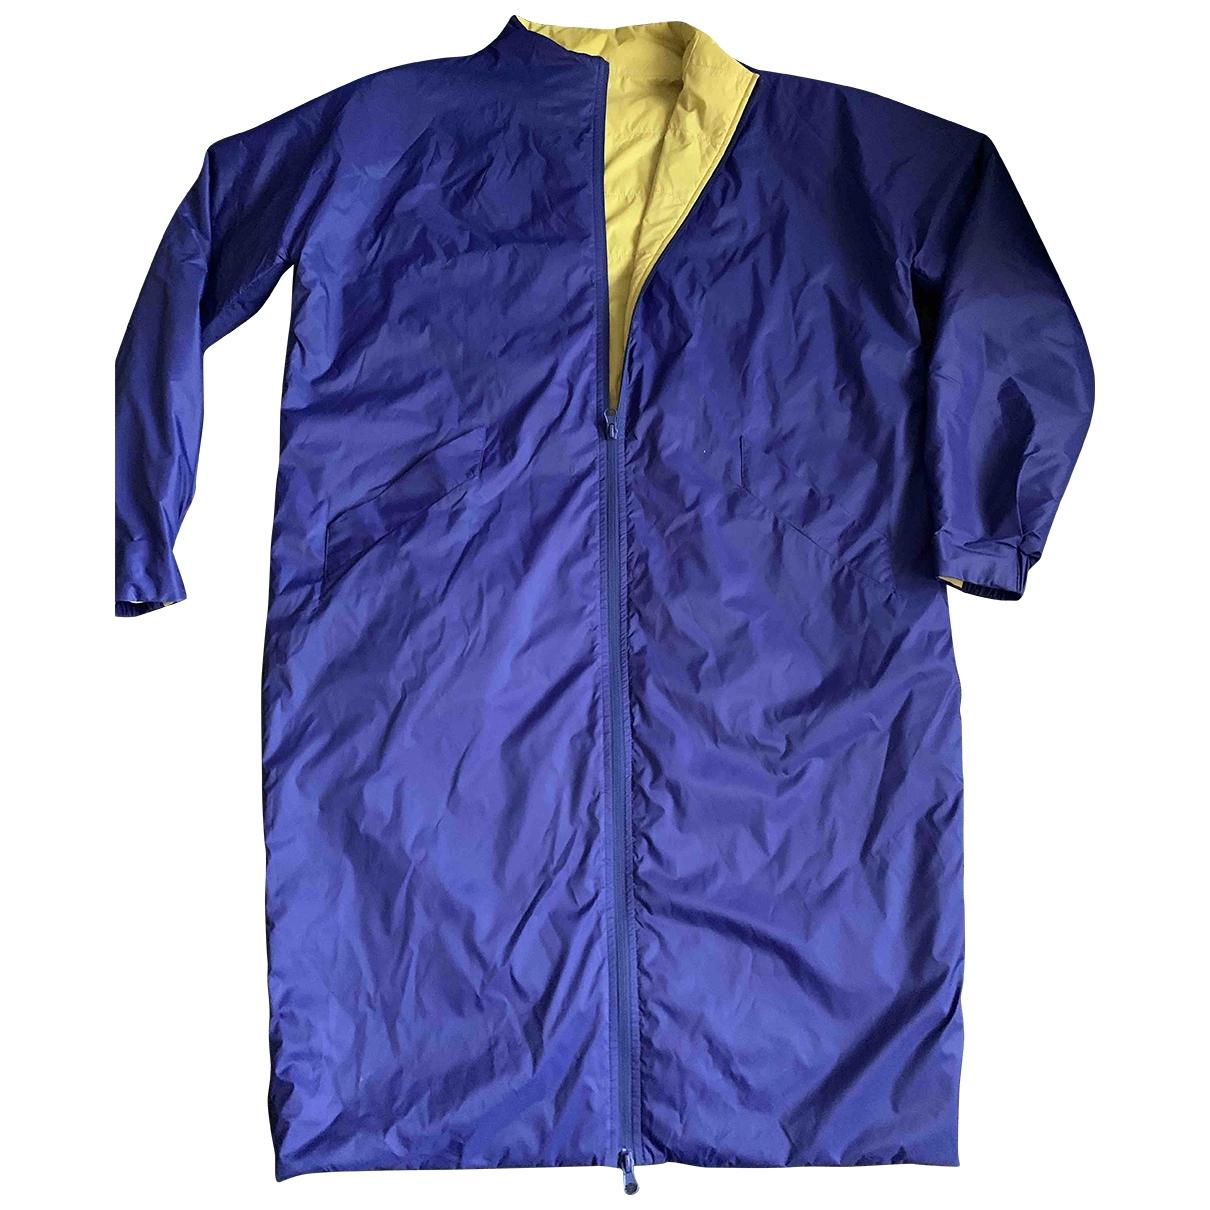 Ecoalf \N Blue coat for Women M International